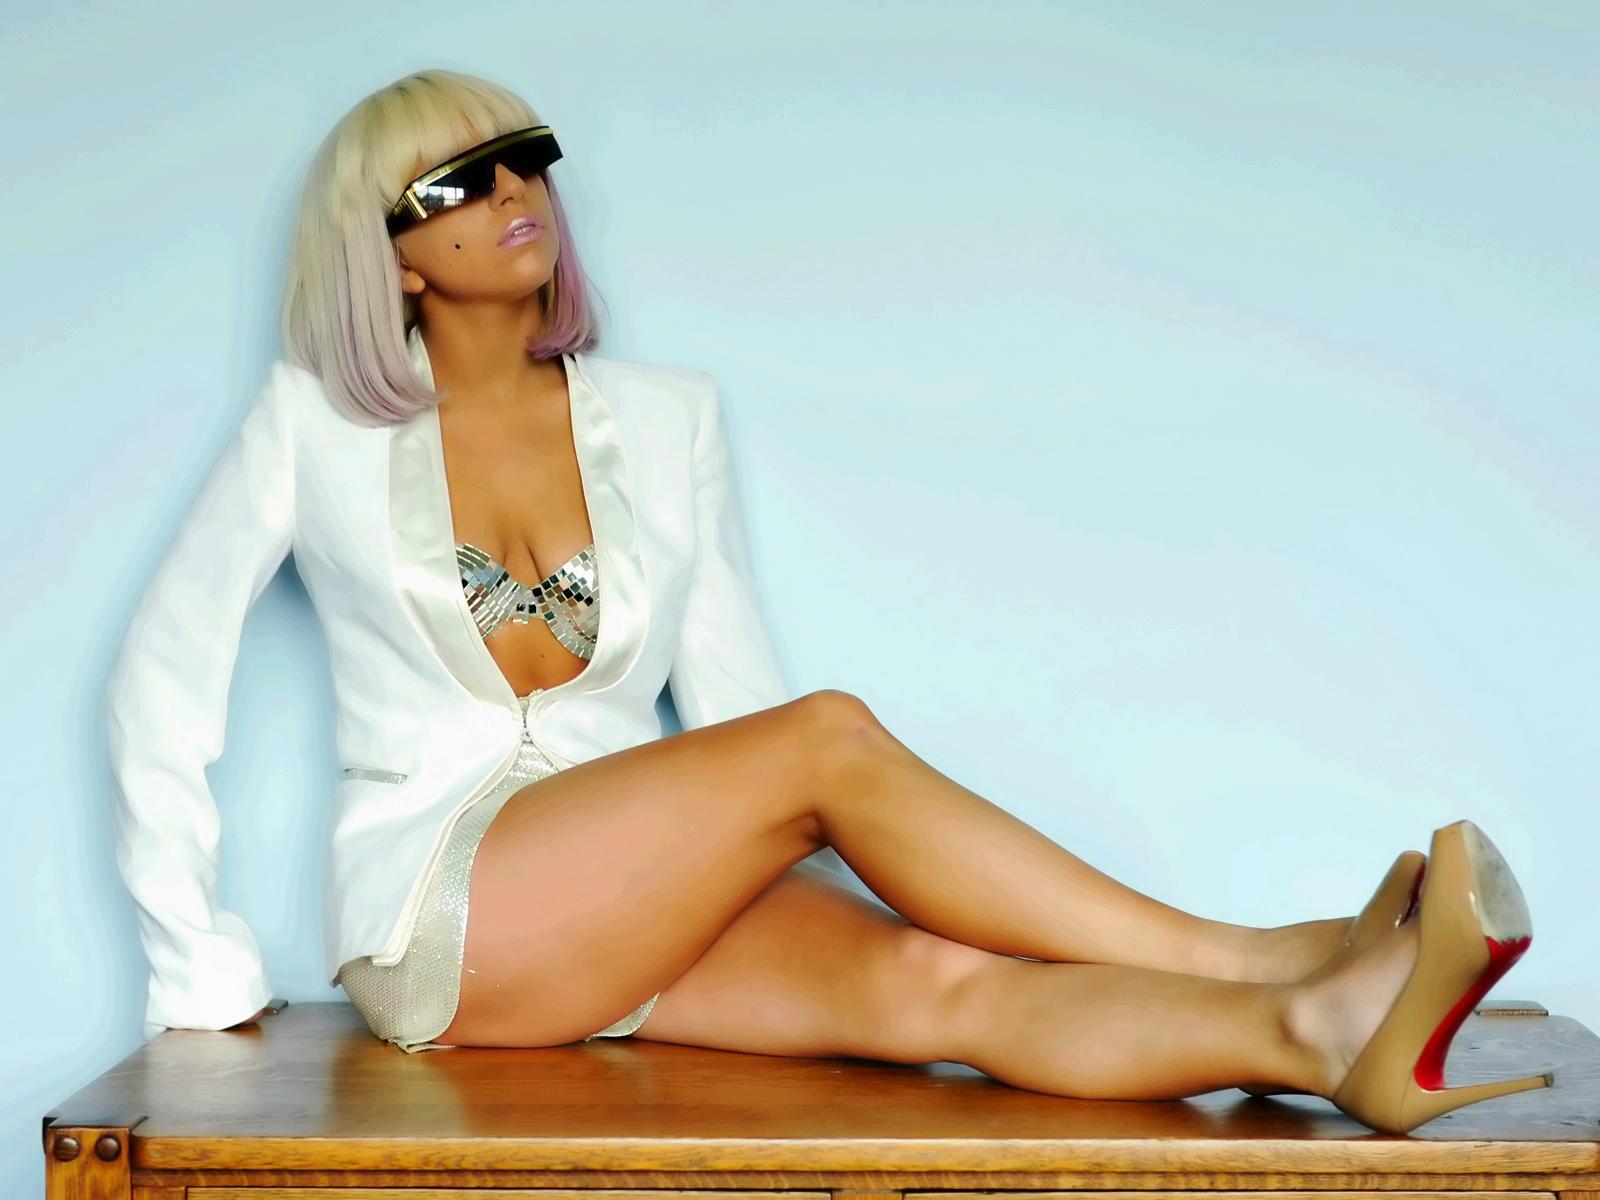 Wongseng Hd Wallpapers Sexy Lady Gaga Legs Wallpaper